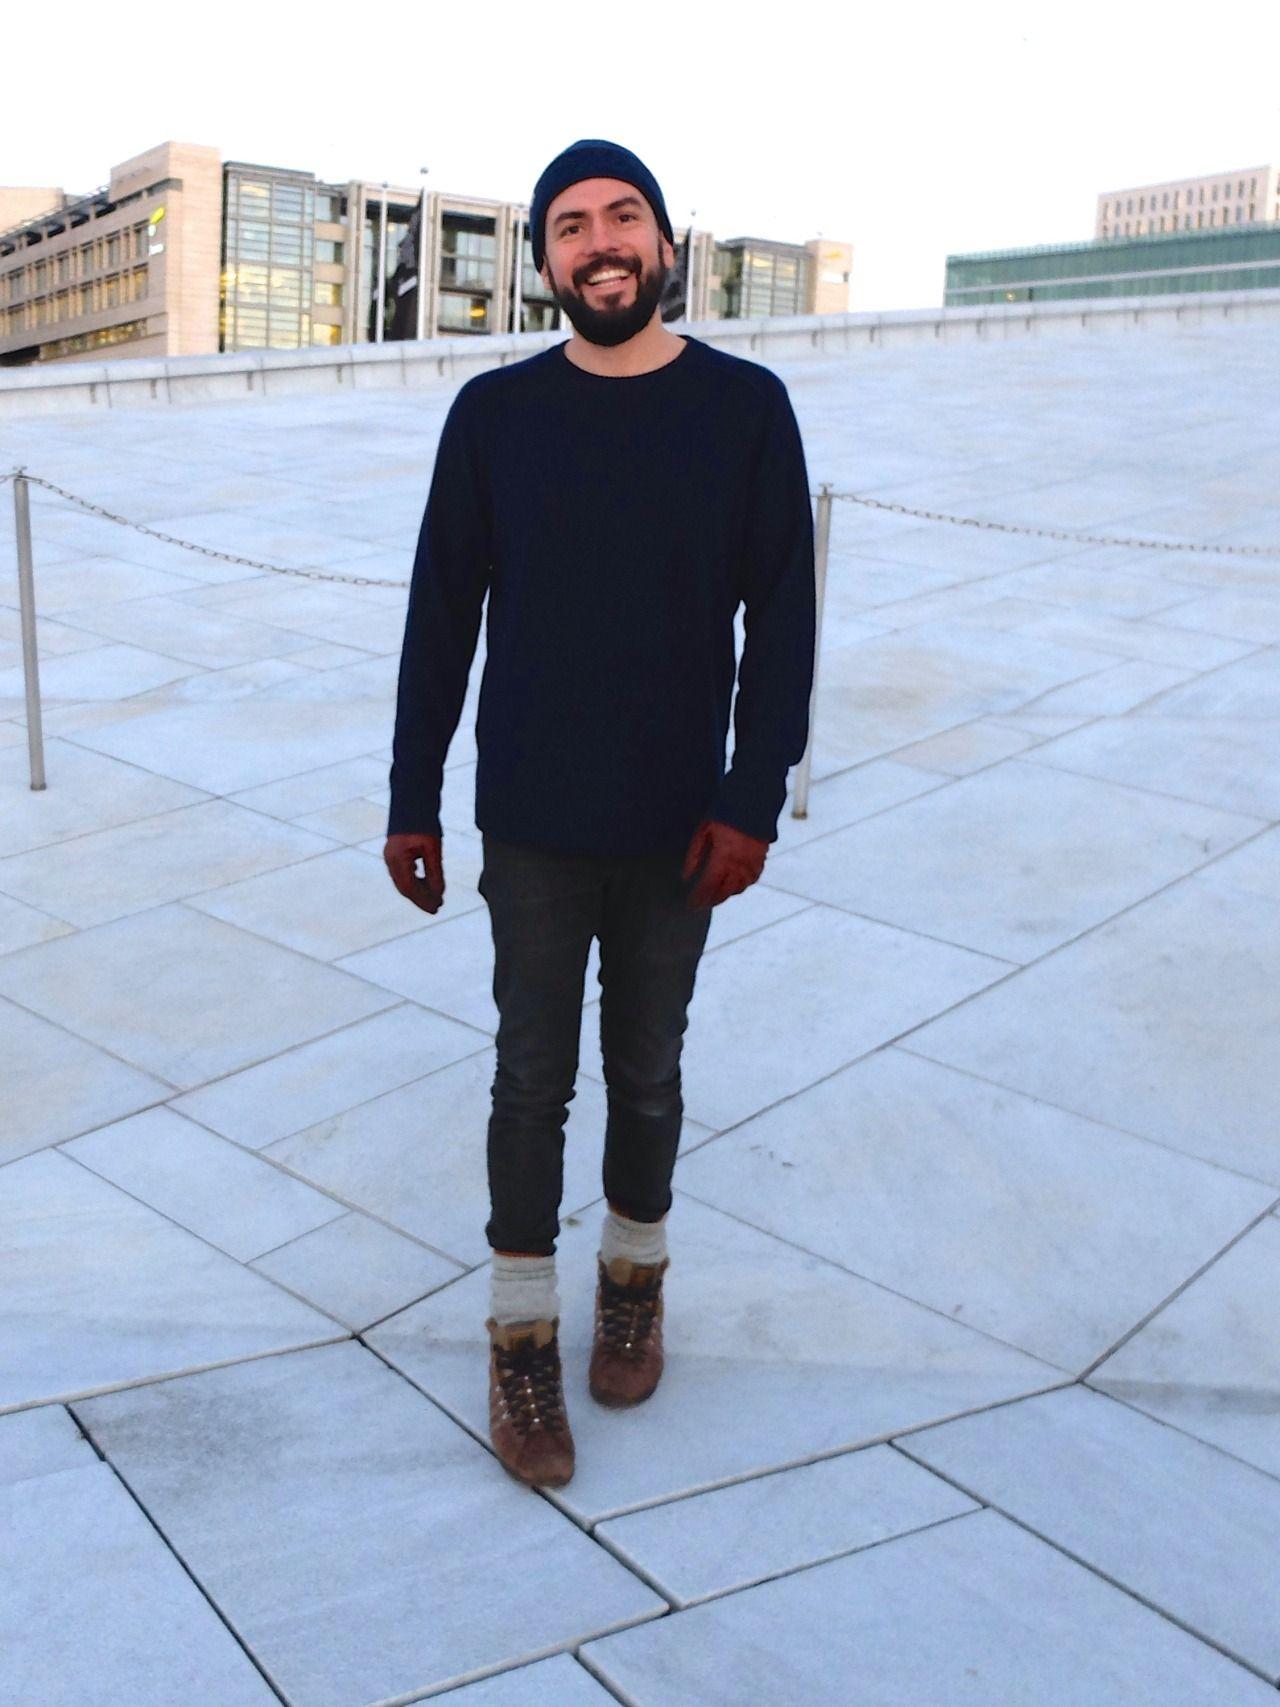 0d008592 Opera House, Oslo Sneakers: Adidas, Star Wars Limited Edition, Chewbacca.  Jeans: Edwin Jeans Sweater: Filippa K Gloves: Filippa K Beanie: Norse  Projects